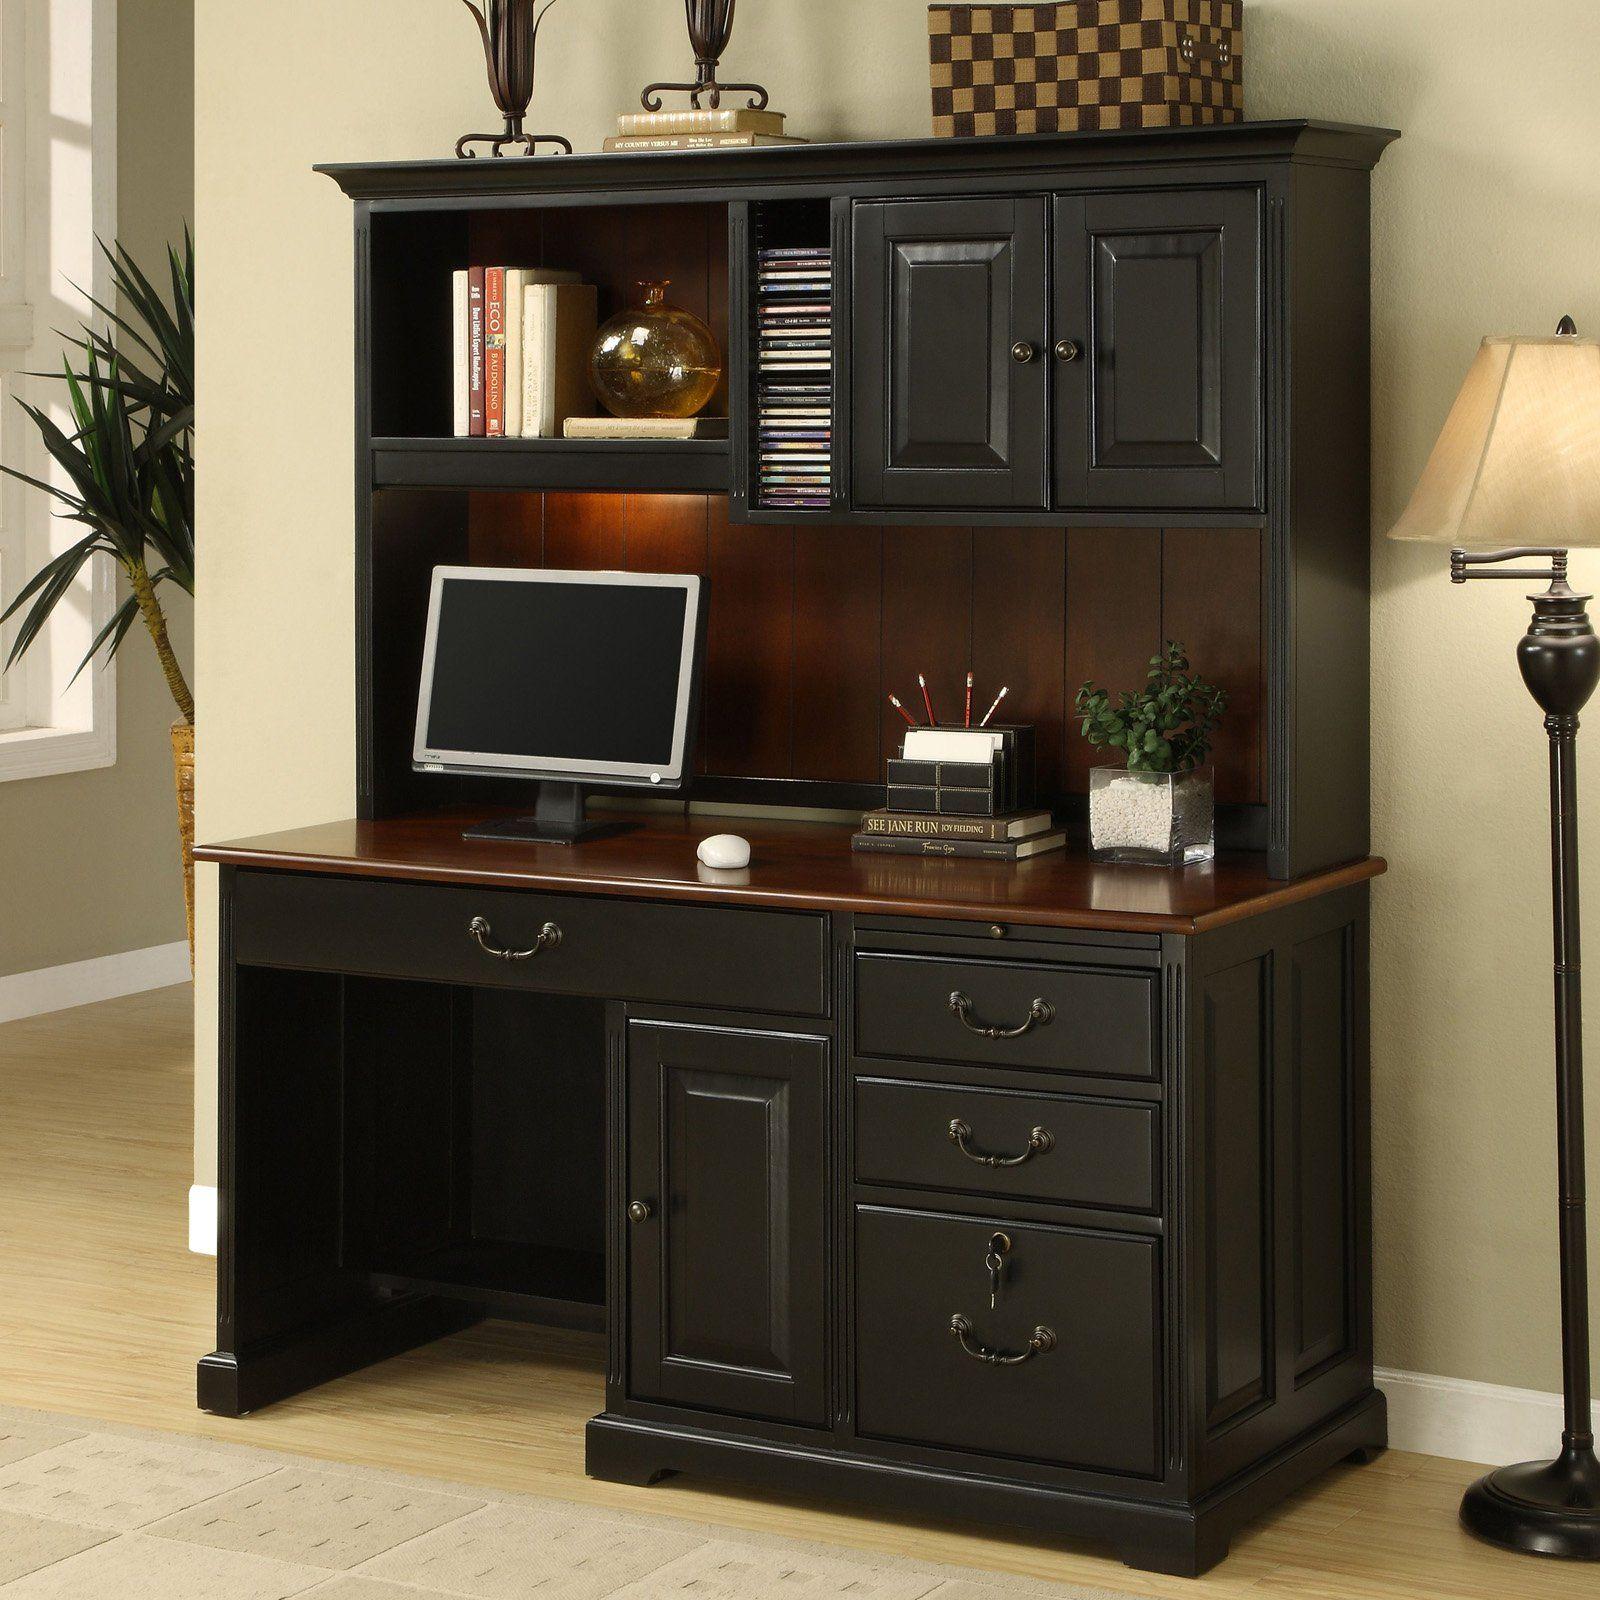 Riverside Home Office Executive Desk 44732: Have To Have It. Riverside Bridgeport 58-in. Computer Desk